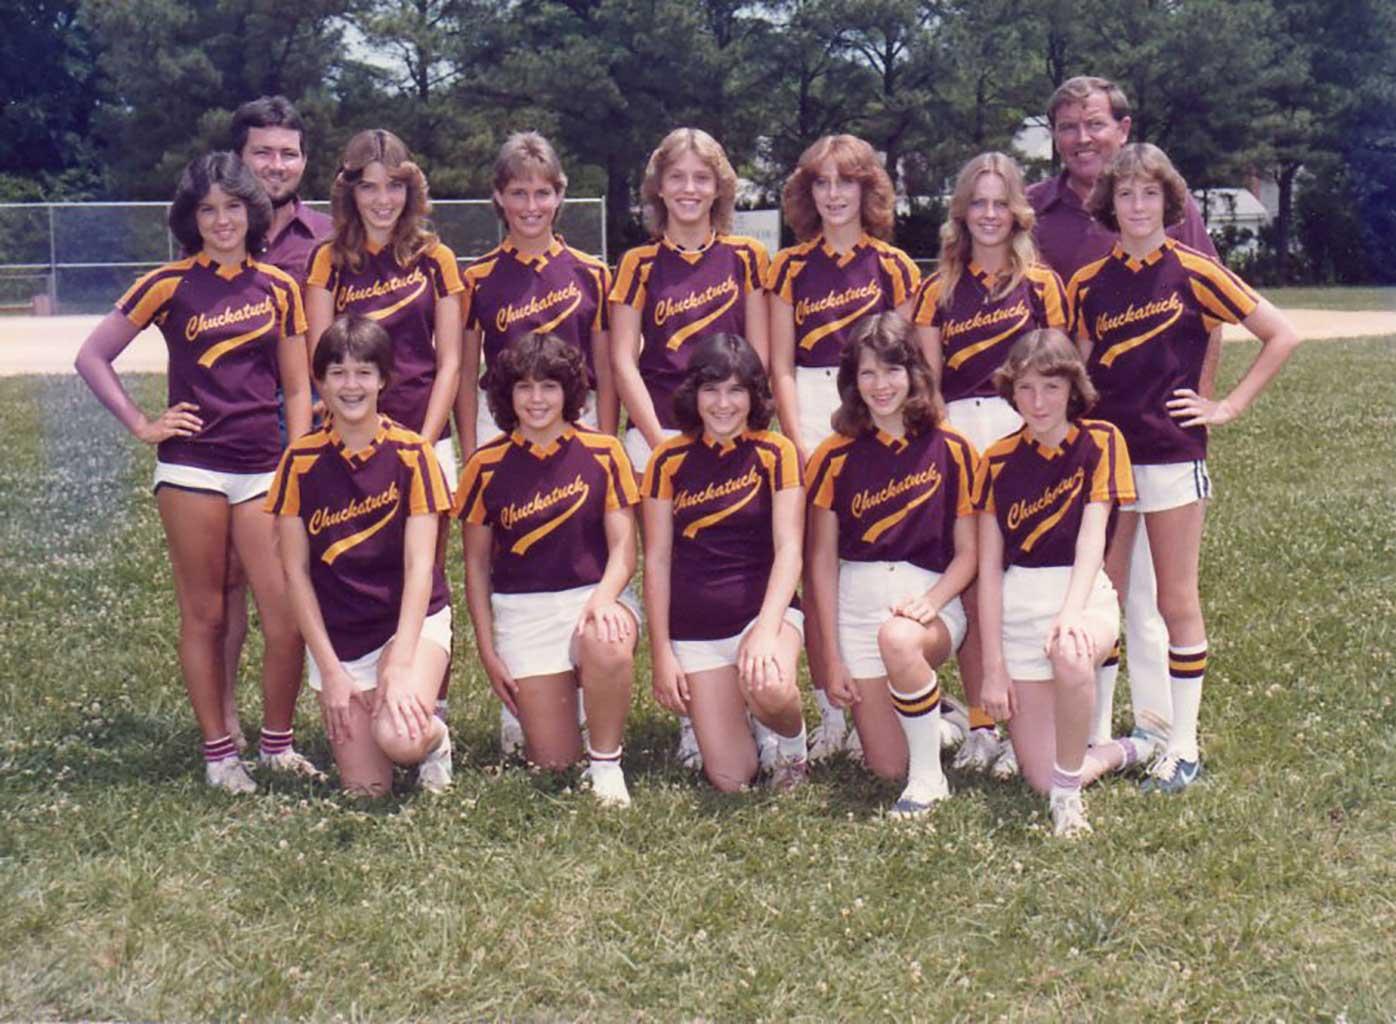 chuckatuck-sports-league-softball-team-1982-coaches-paul-gwaltney-and-jack-knight-img490